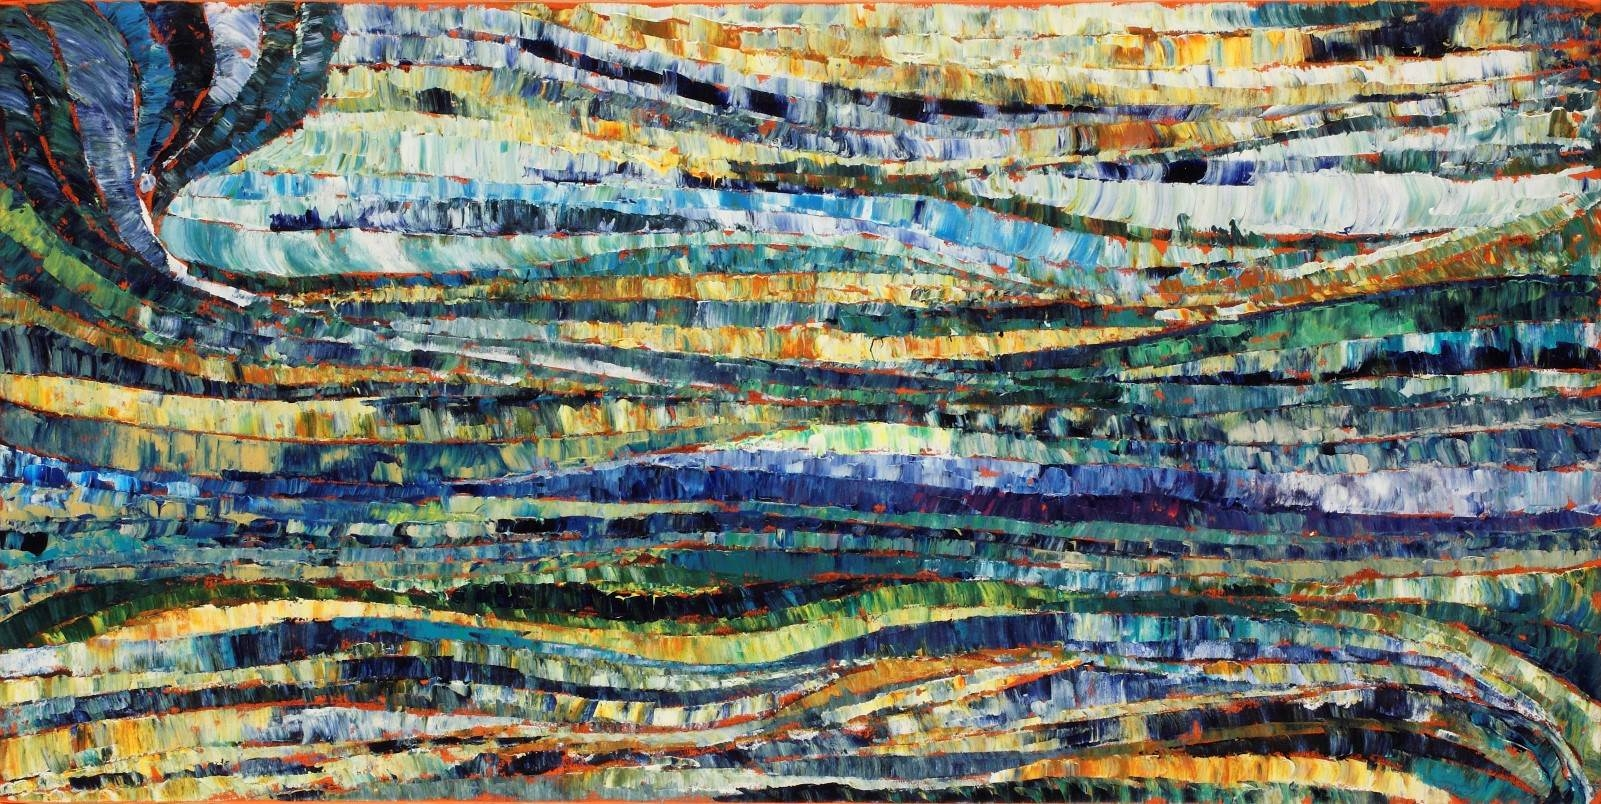 David Gista,Equinox,Acrylic on Canvas,20''x40'' image